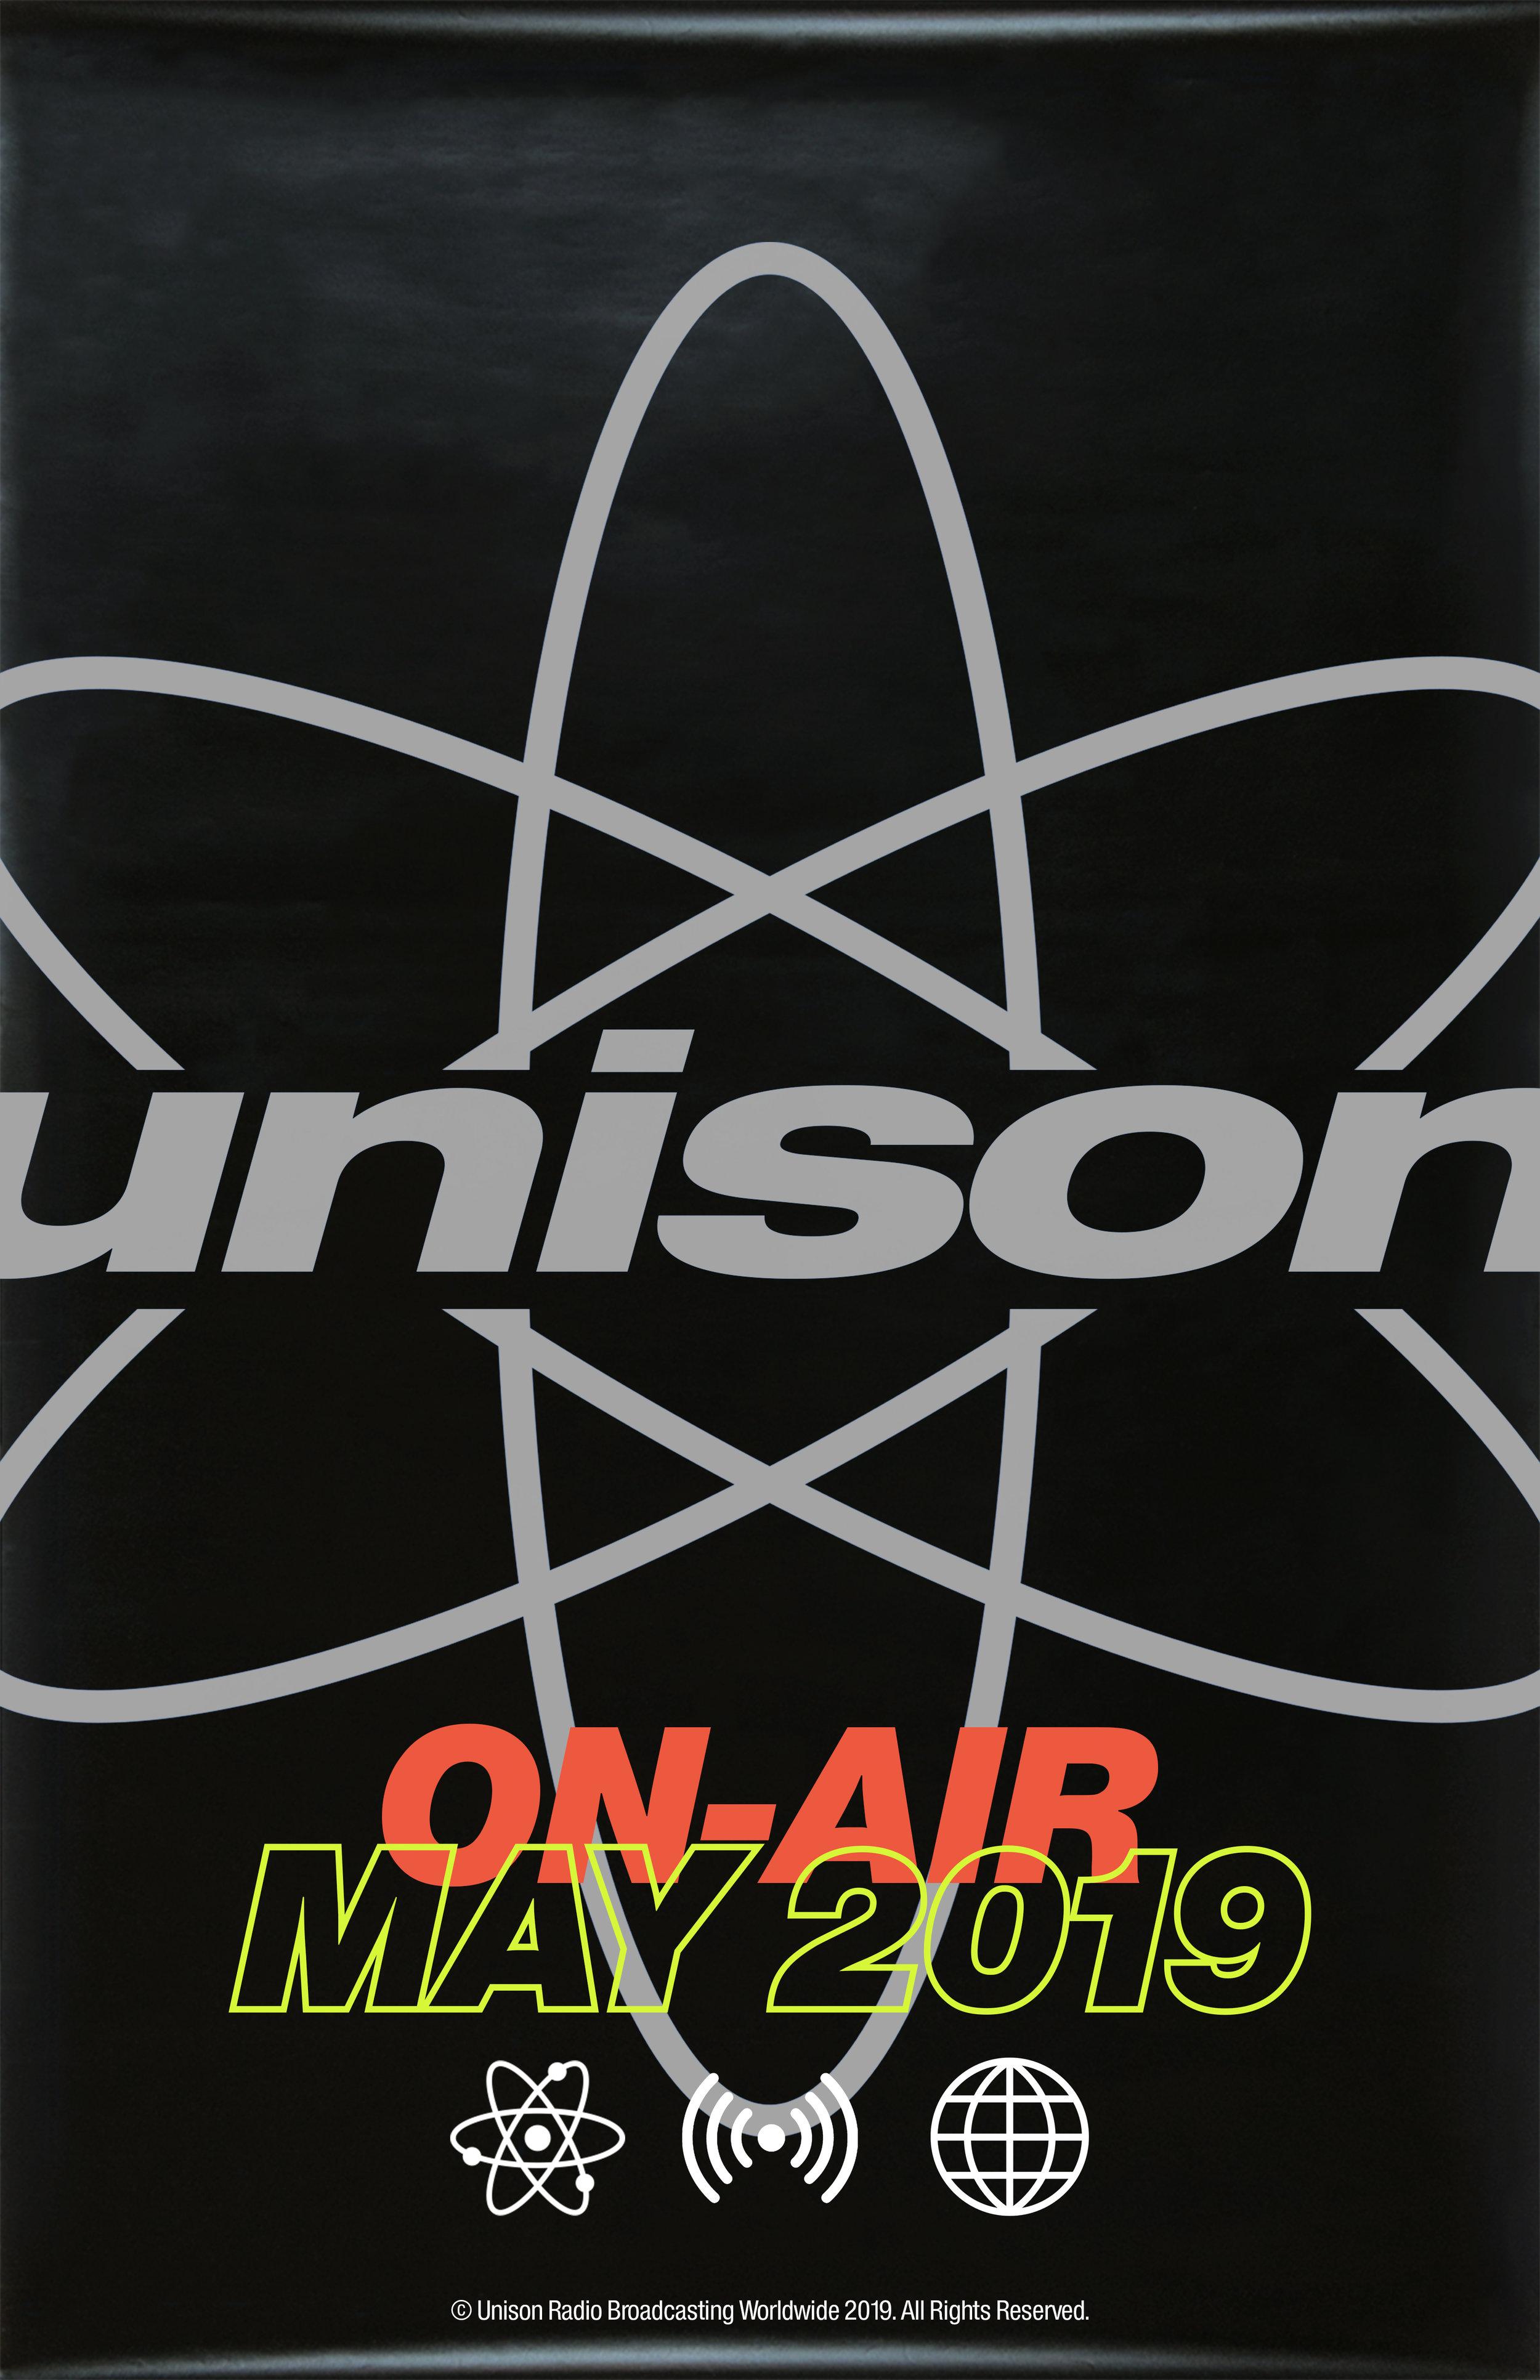 unison promo posters 11x17 grey logo.jpg